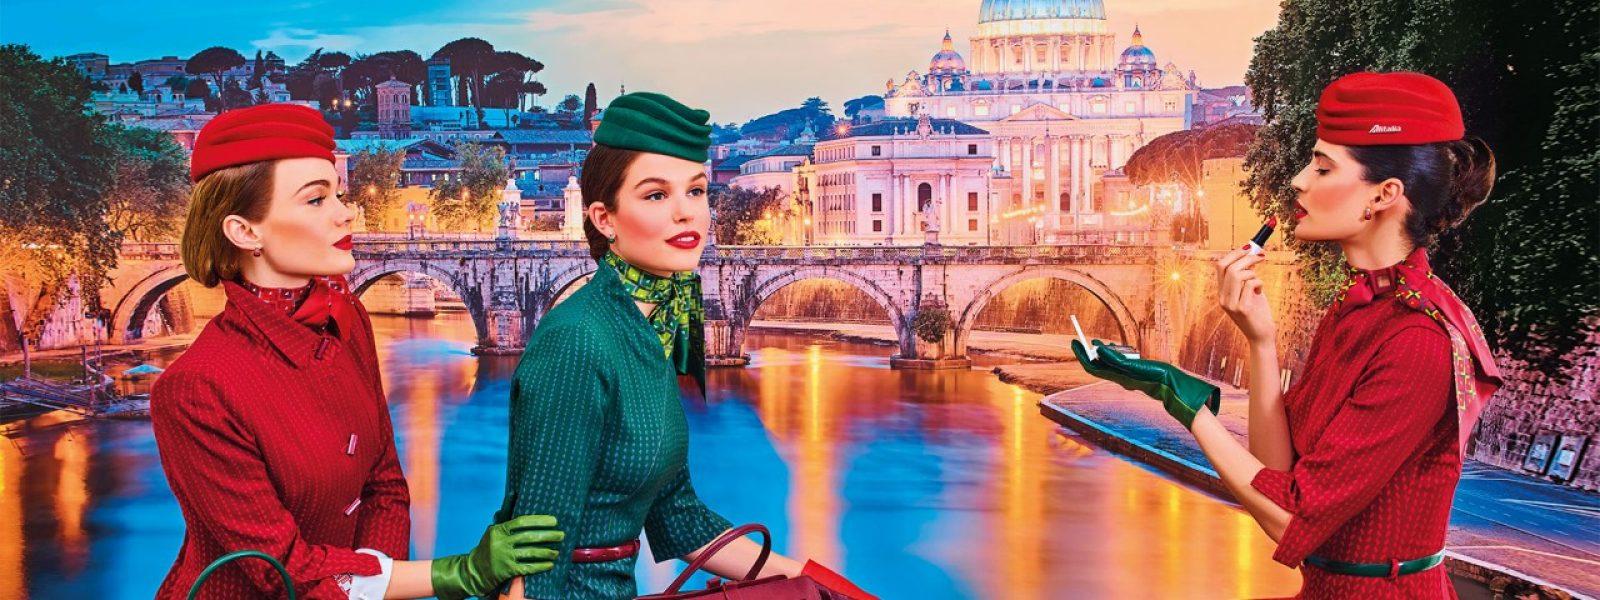 Alitalia скидка на билеты